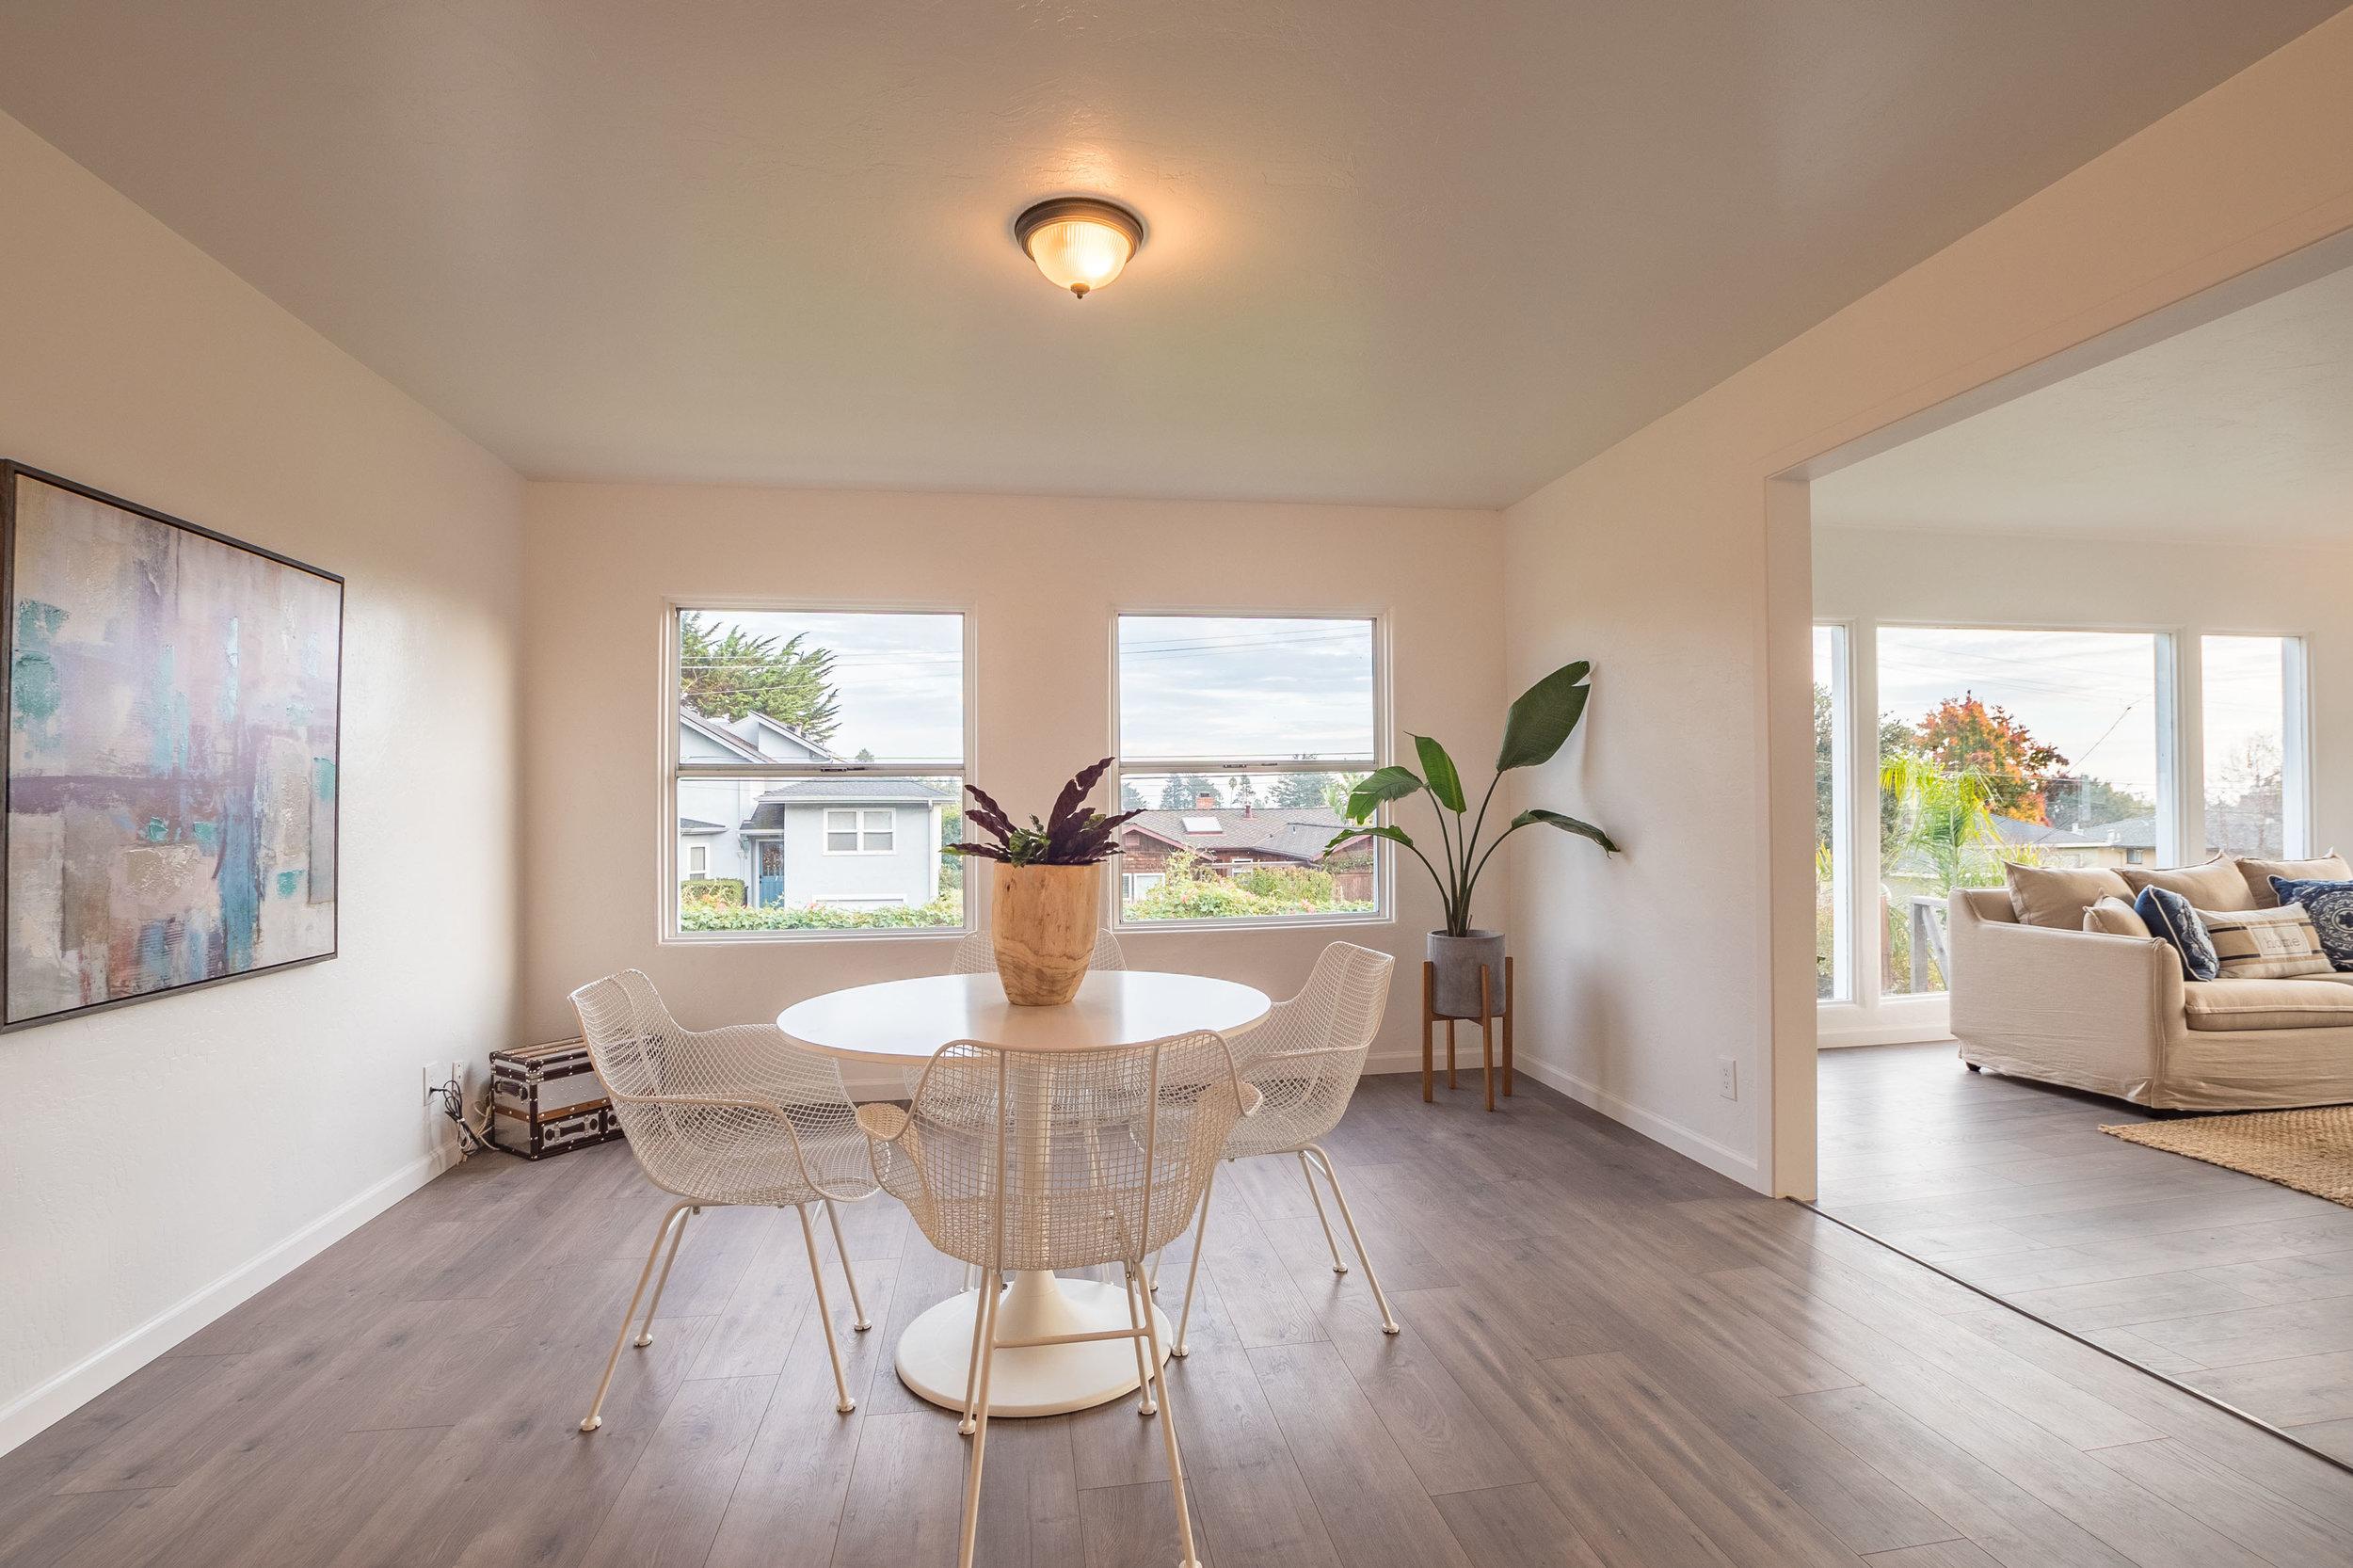 Remodeled Three Bedroom Upper Westside House with ADU in Santa Cruz, California.  Presented by Sam Bird-Robinson, Realtor in Santa Cruz